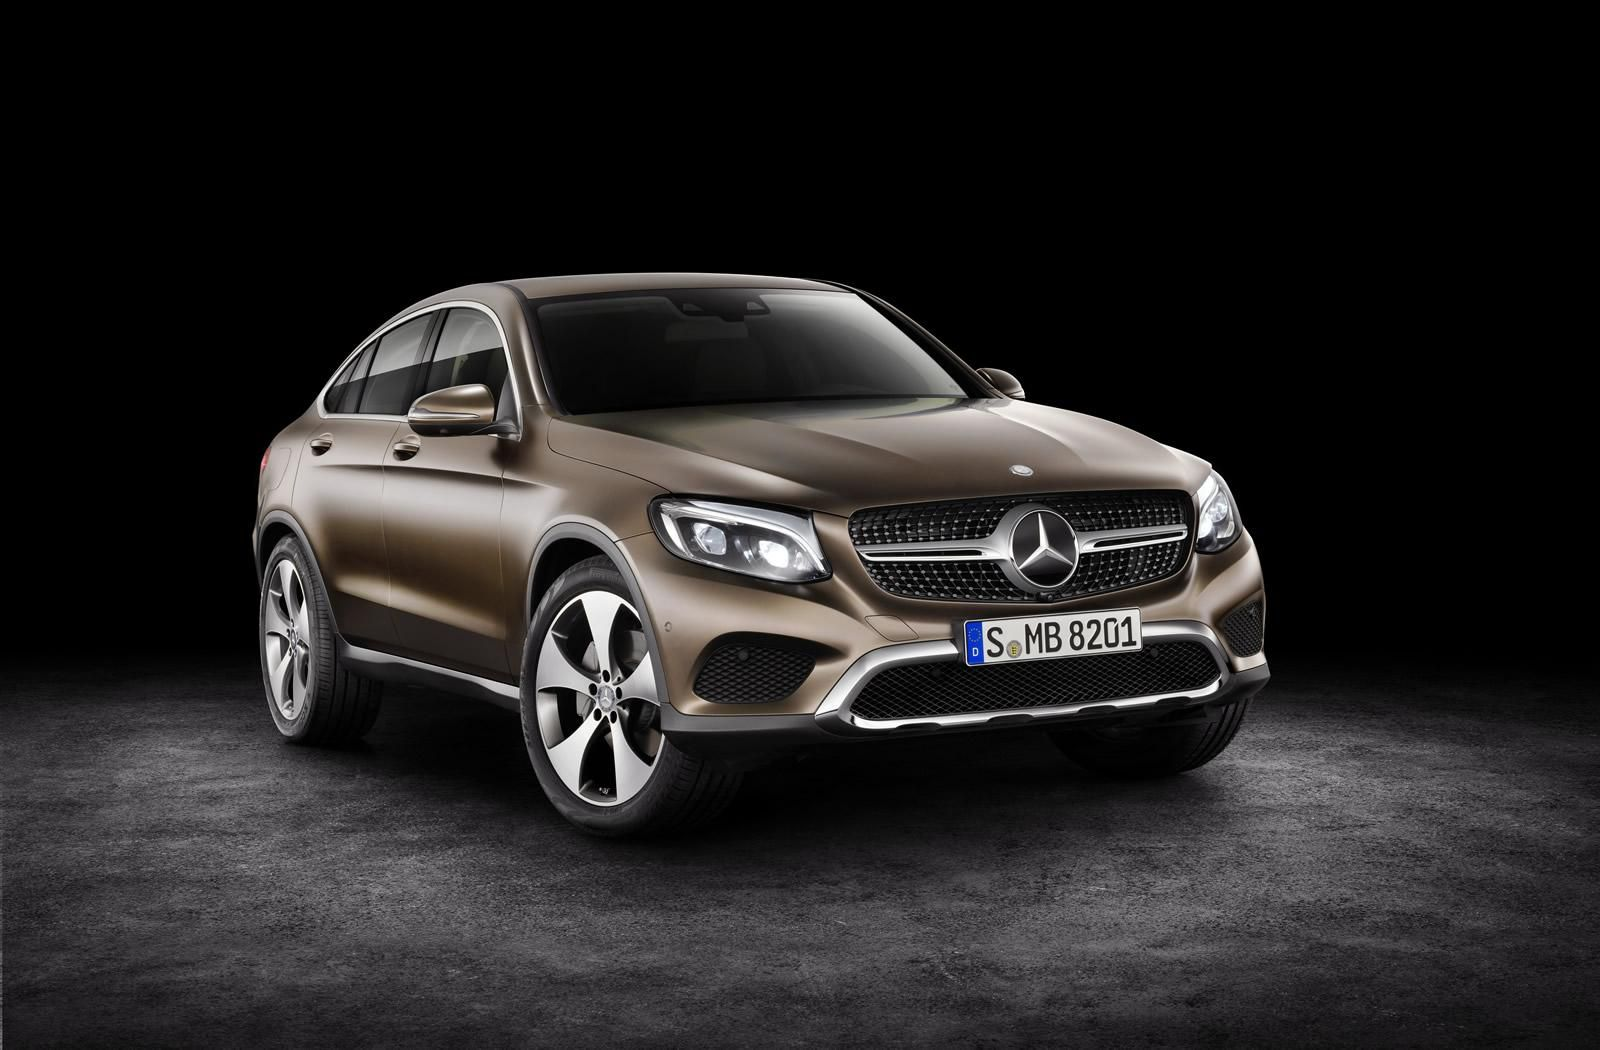 2016 New York Motor Show Mercedes Glc Coupe Mercedes Benz Glc